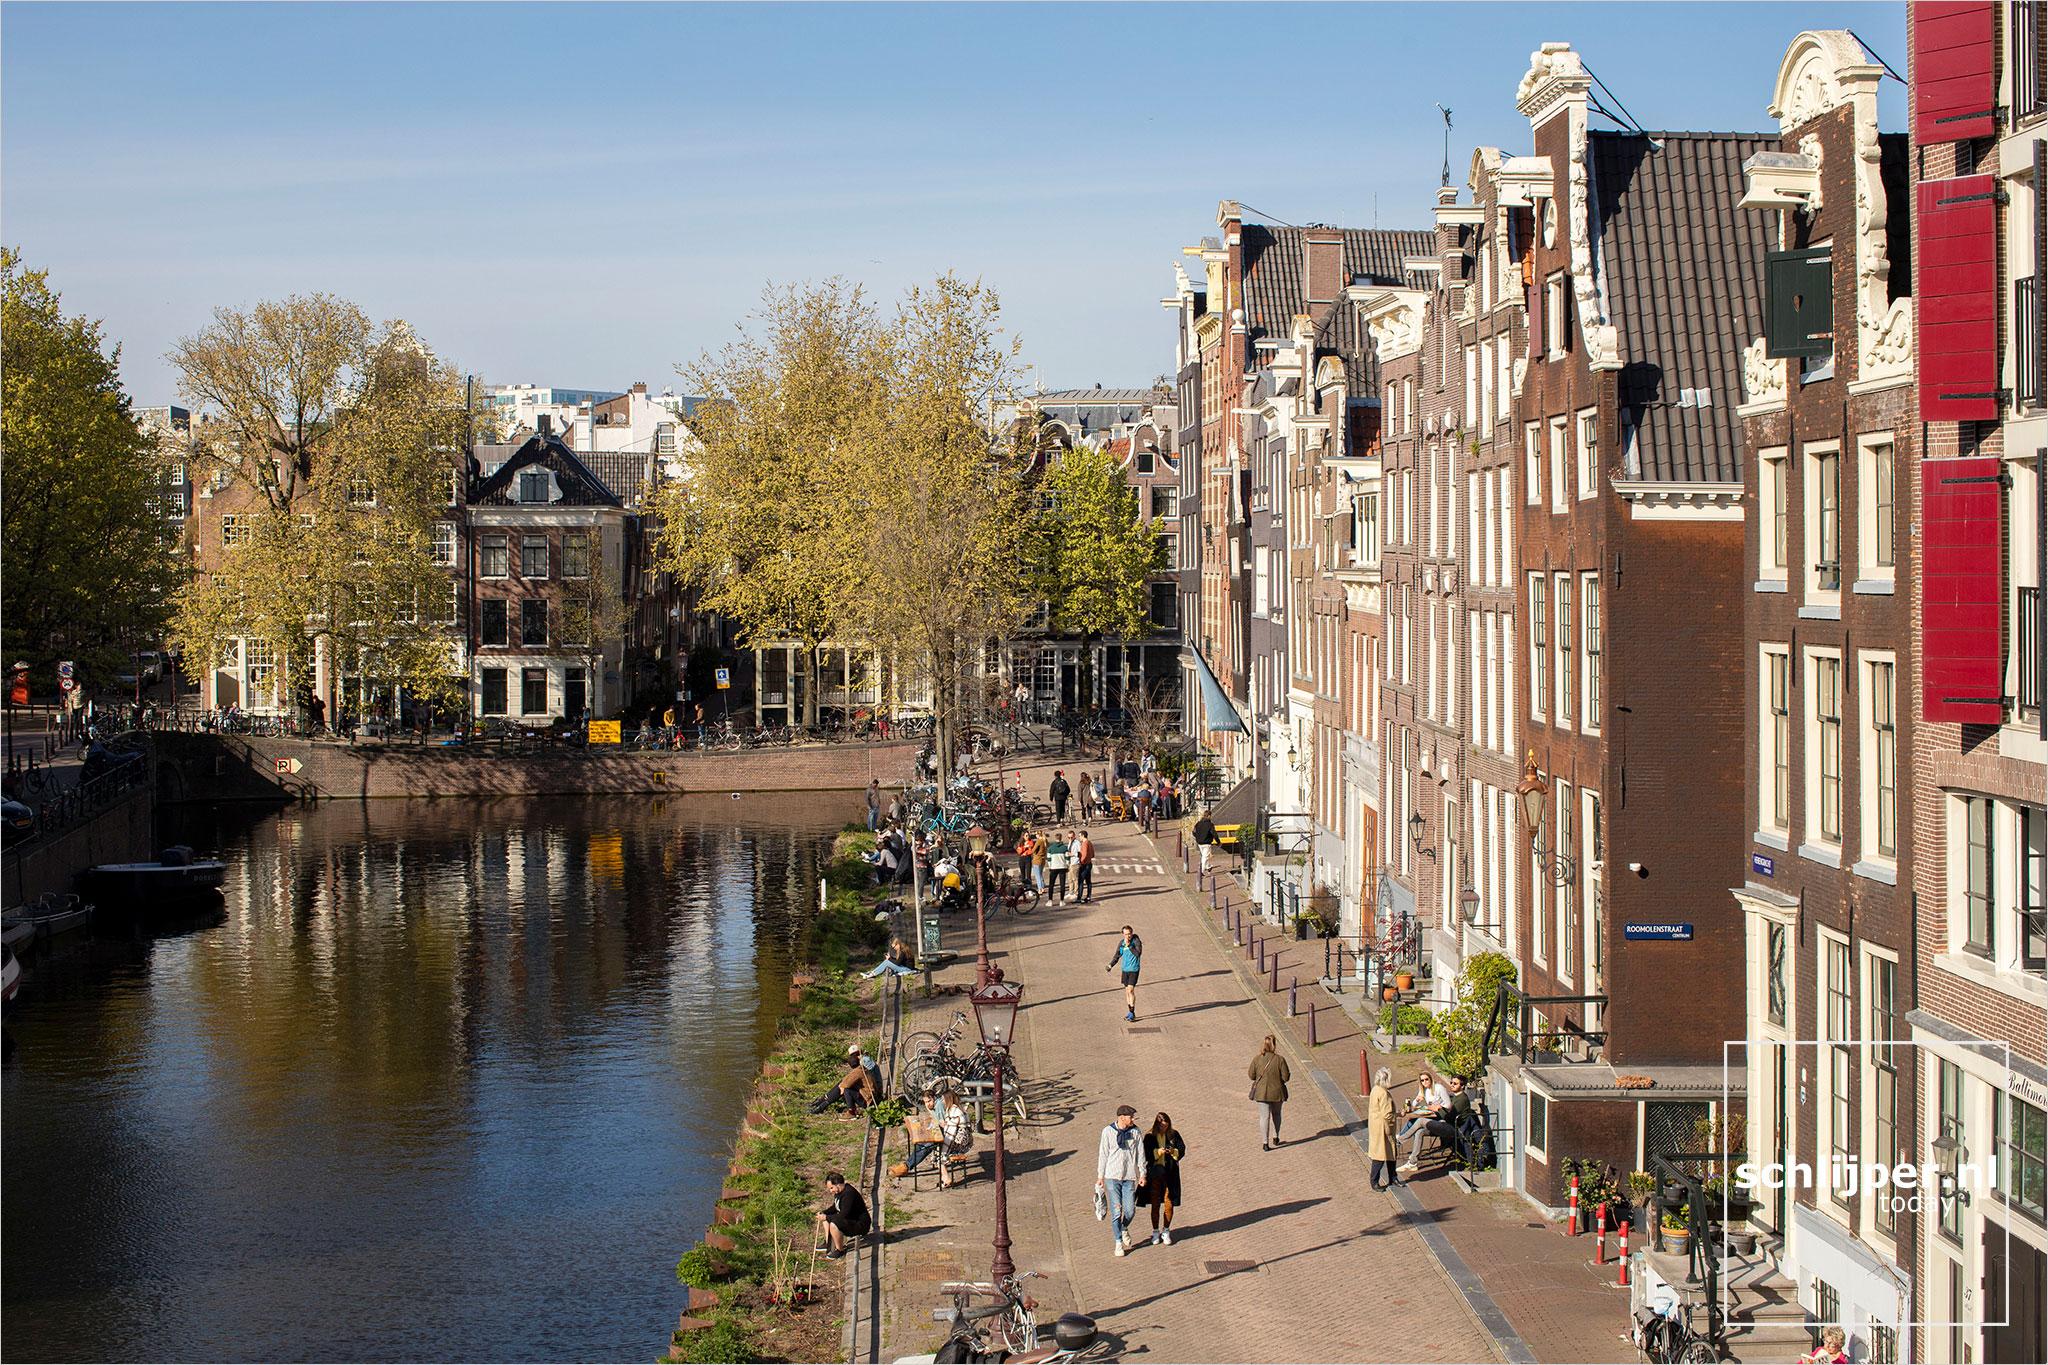 The Netherlands, Amsterdam, 2 mei 2021